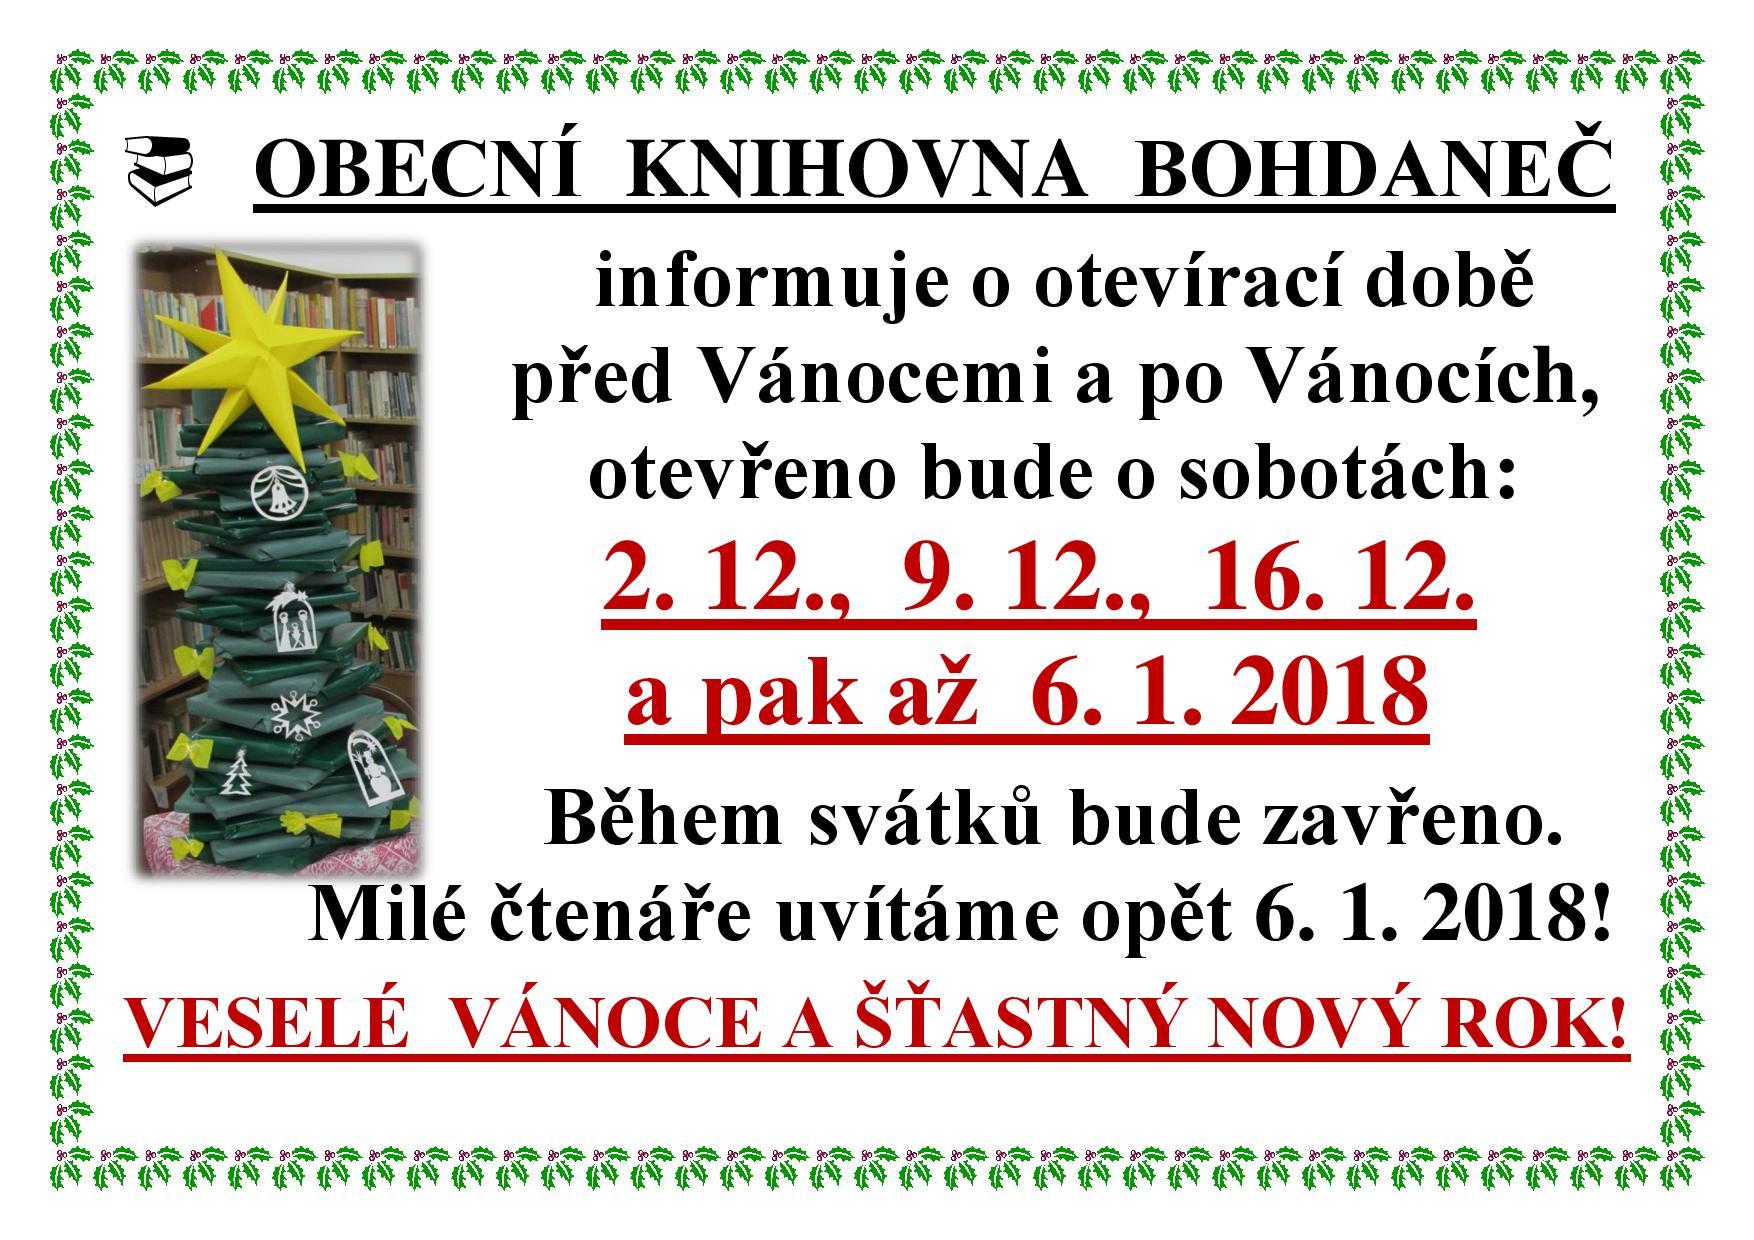 OBRÁZEK : oteviraci_doba_vanoce_2017-page-001.jpg